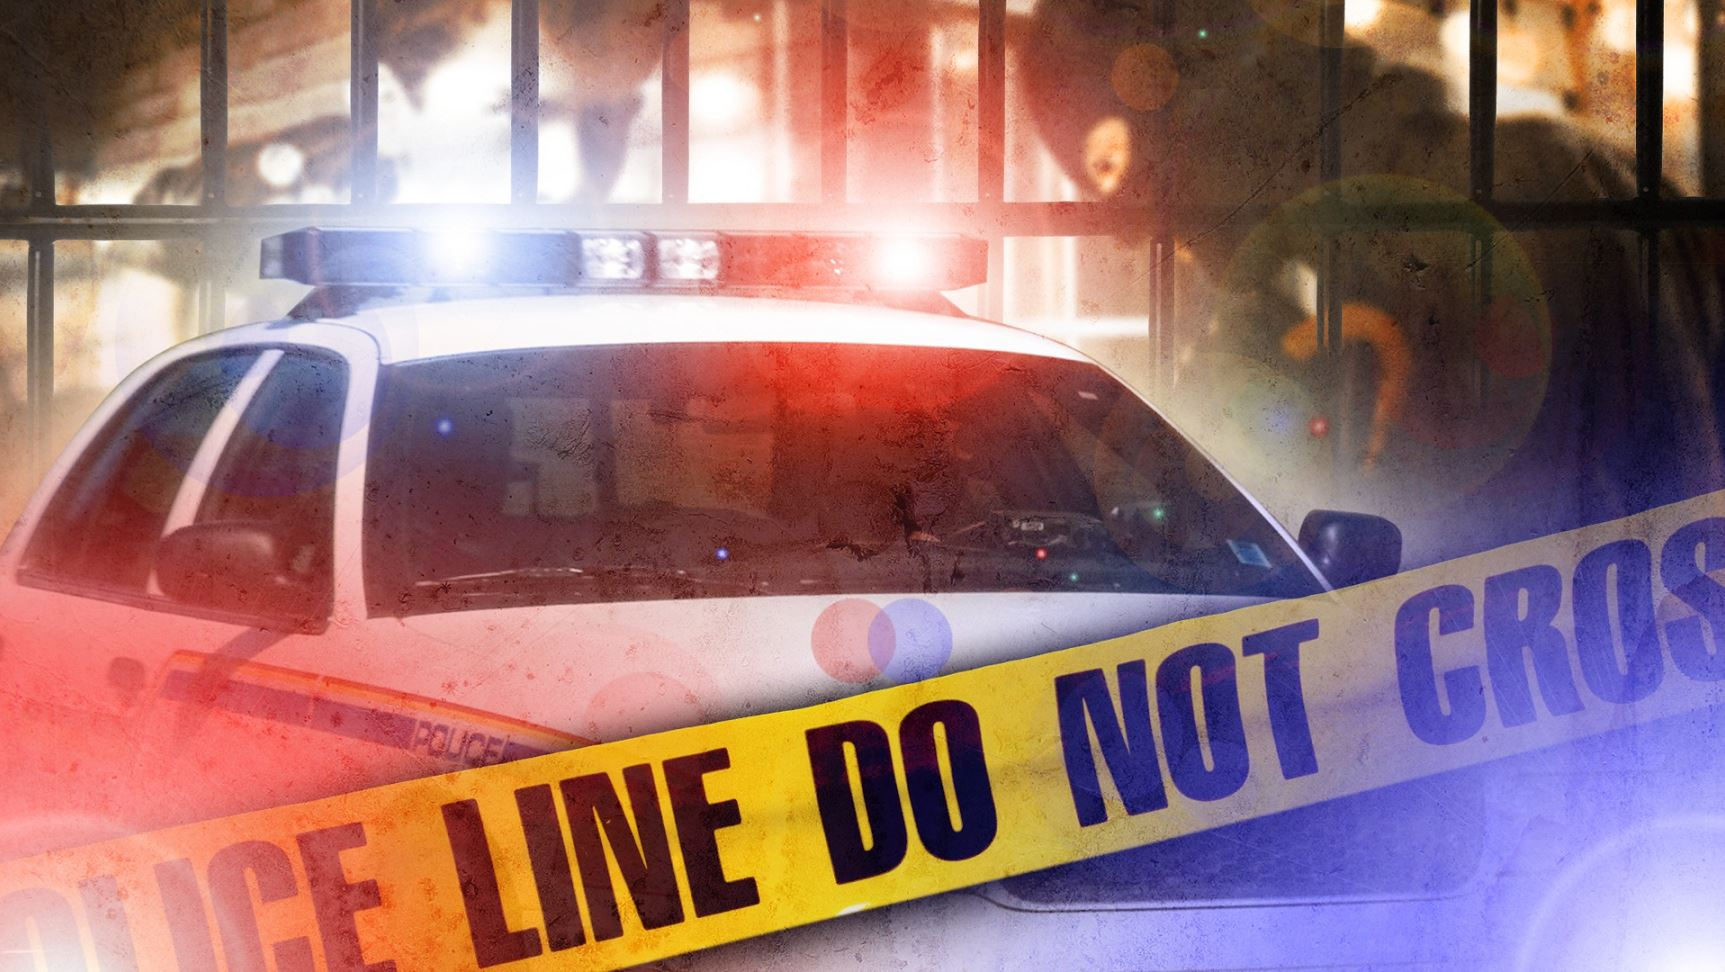 crime generic police robbery shooting arrest richmond police rpd vsp virginia state police henrico_117888